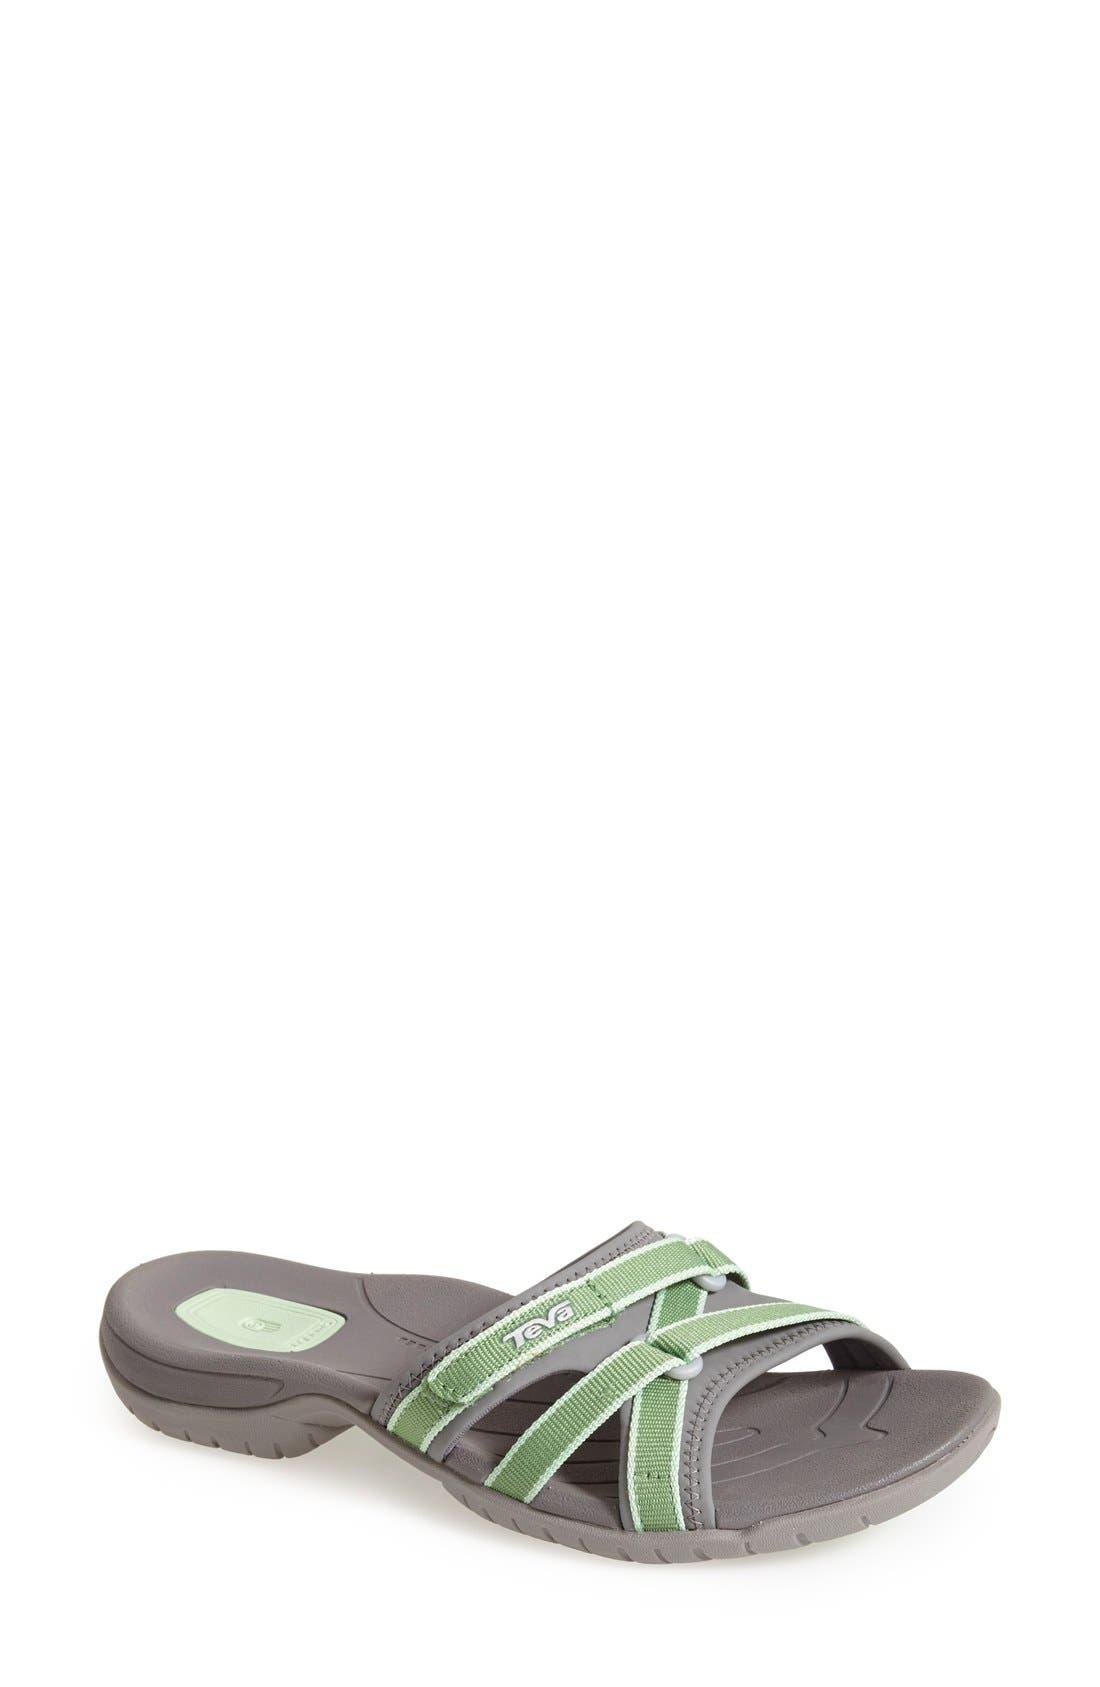 Shoes & Handbags Athletic Teva Womens Tirra Slide Sandal Athletic Sport  Sandals & Slides copesel.com.ar